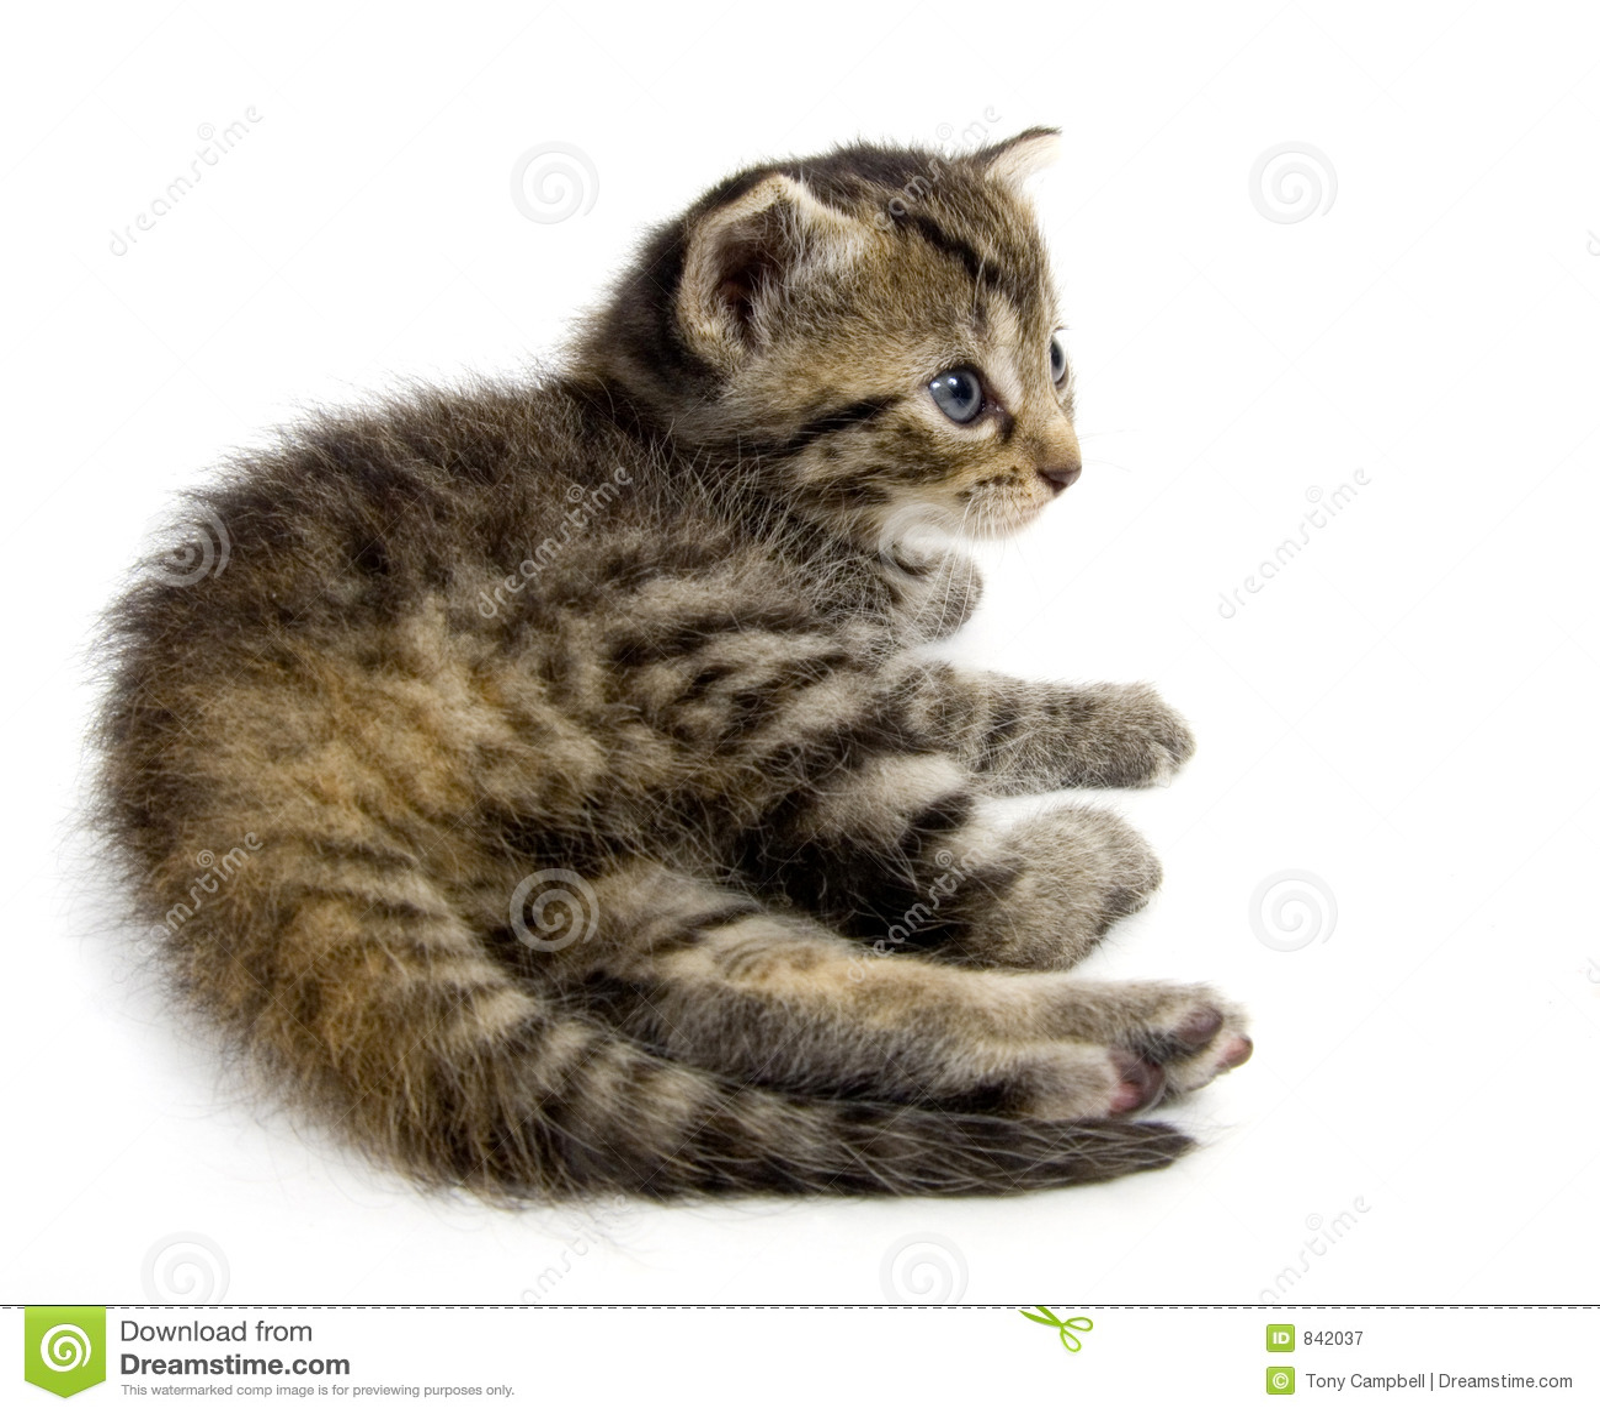 Kitten resting on white background (15mm wide)